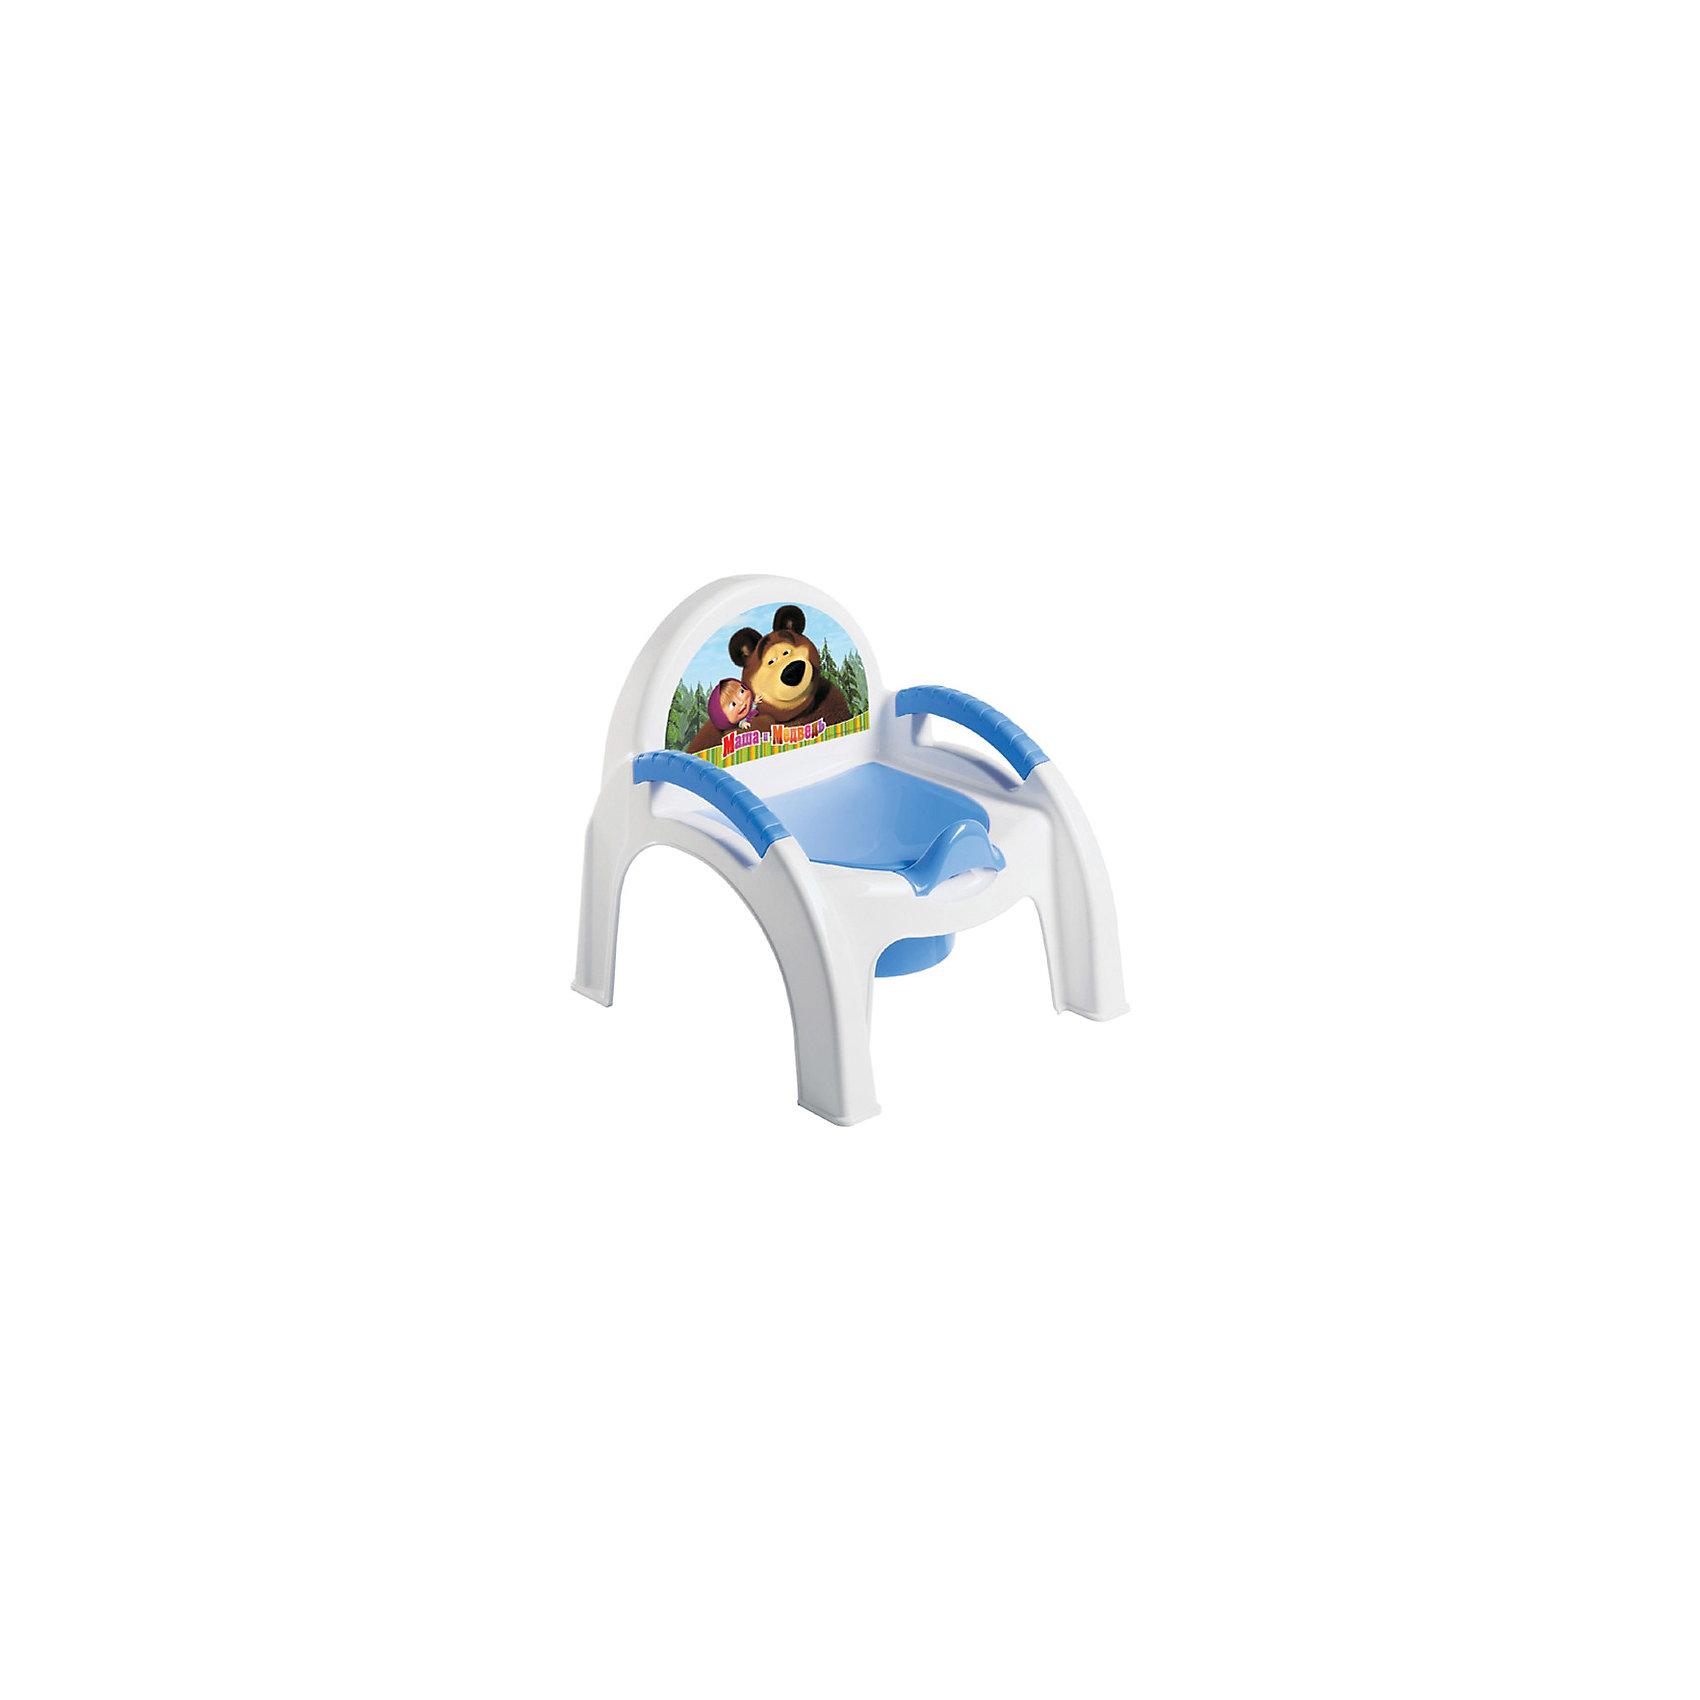 Пластишка Горшок-стульчик Маша и Медведь, Пластишка, магниты маша и медведь купить игрушку